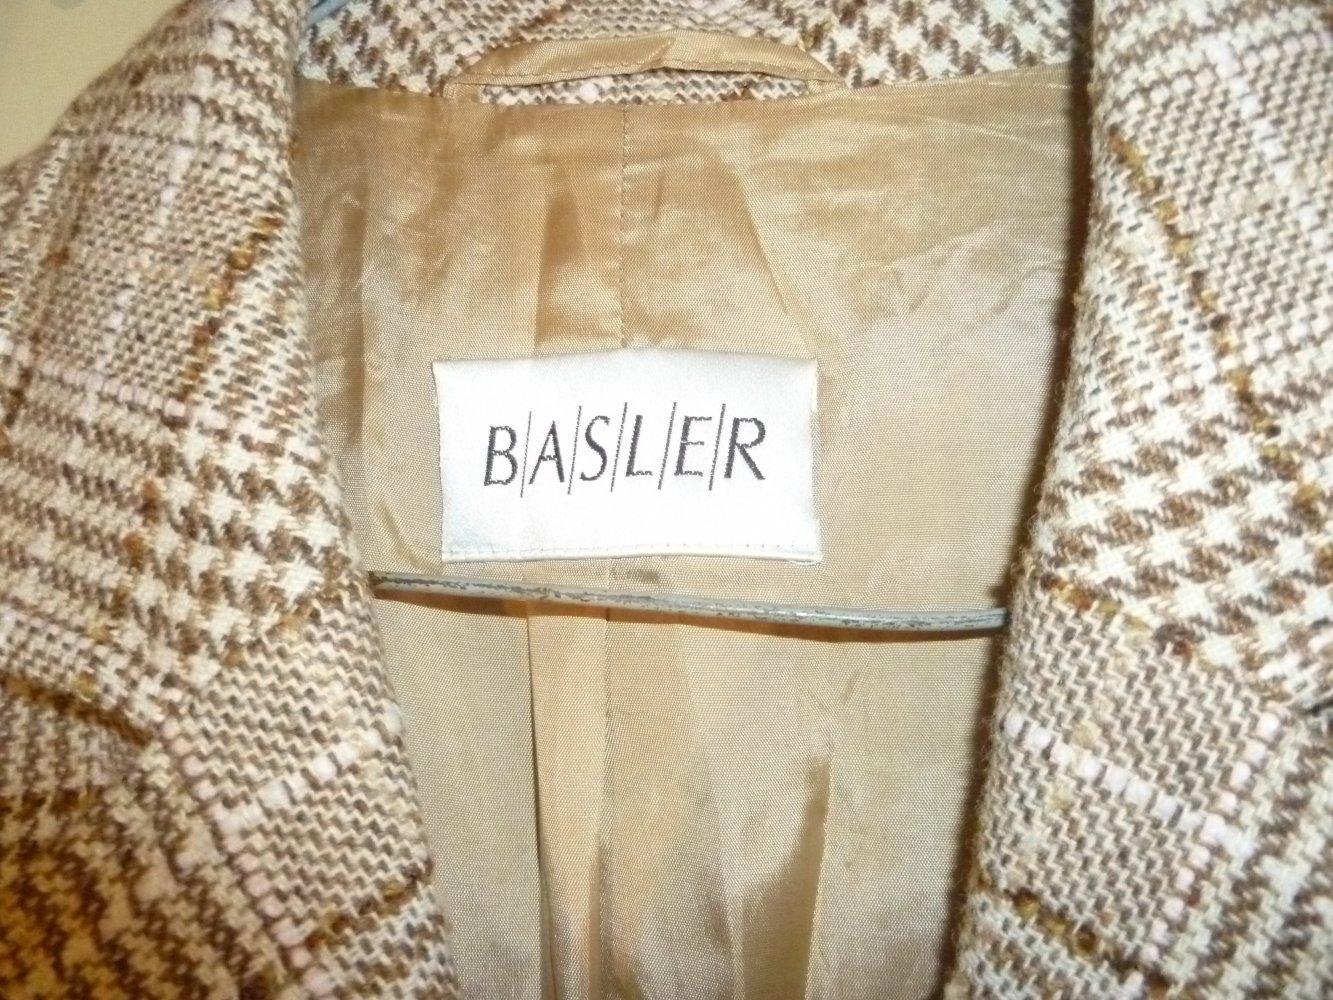 1b1dfe36a87ef Basler - Karierter Blazer    Kleiderkorb.de